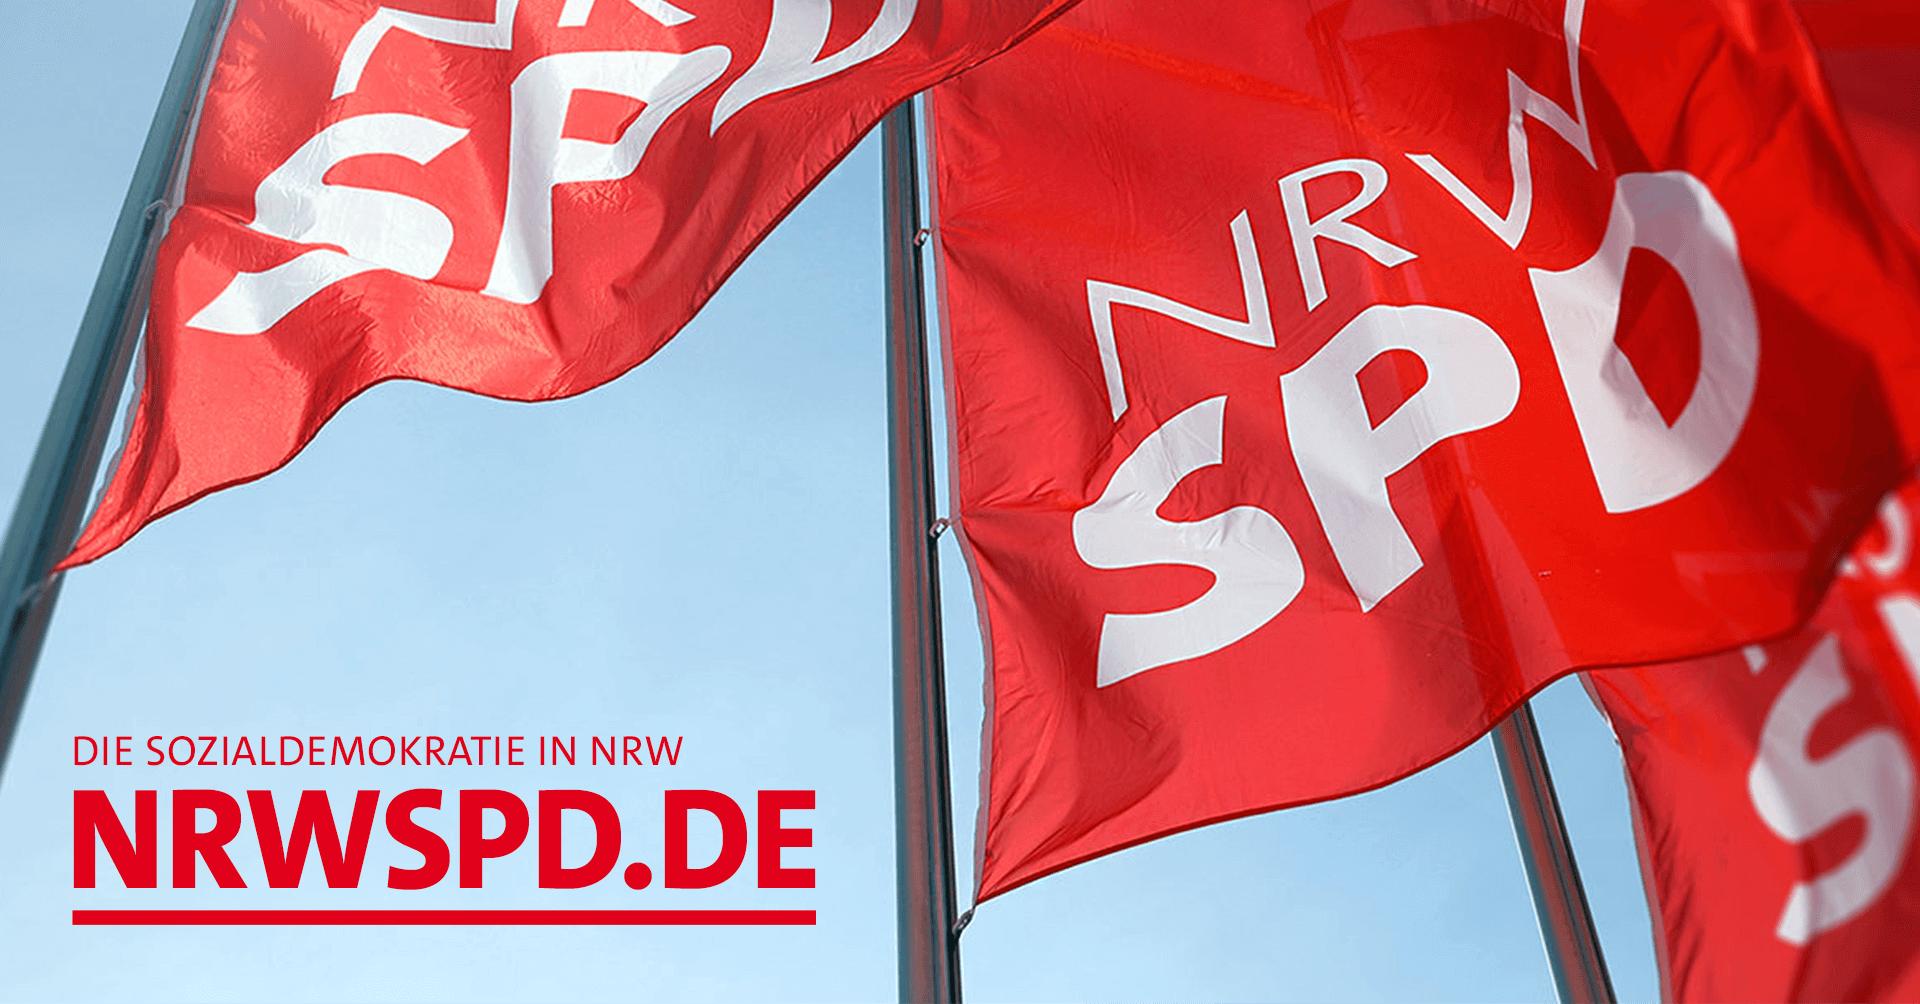 NRWSPD